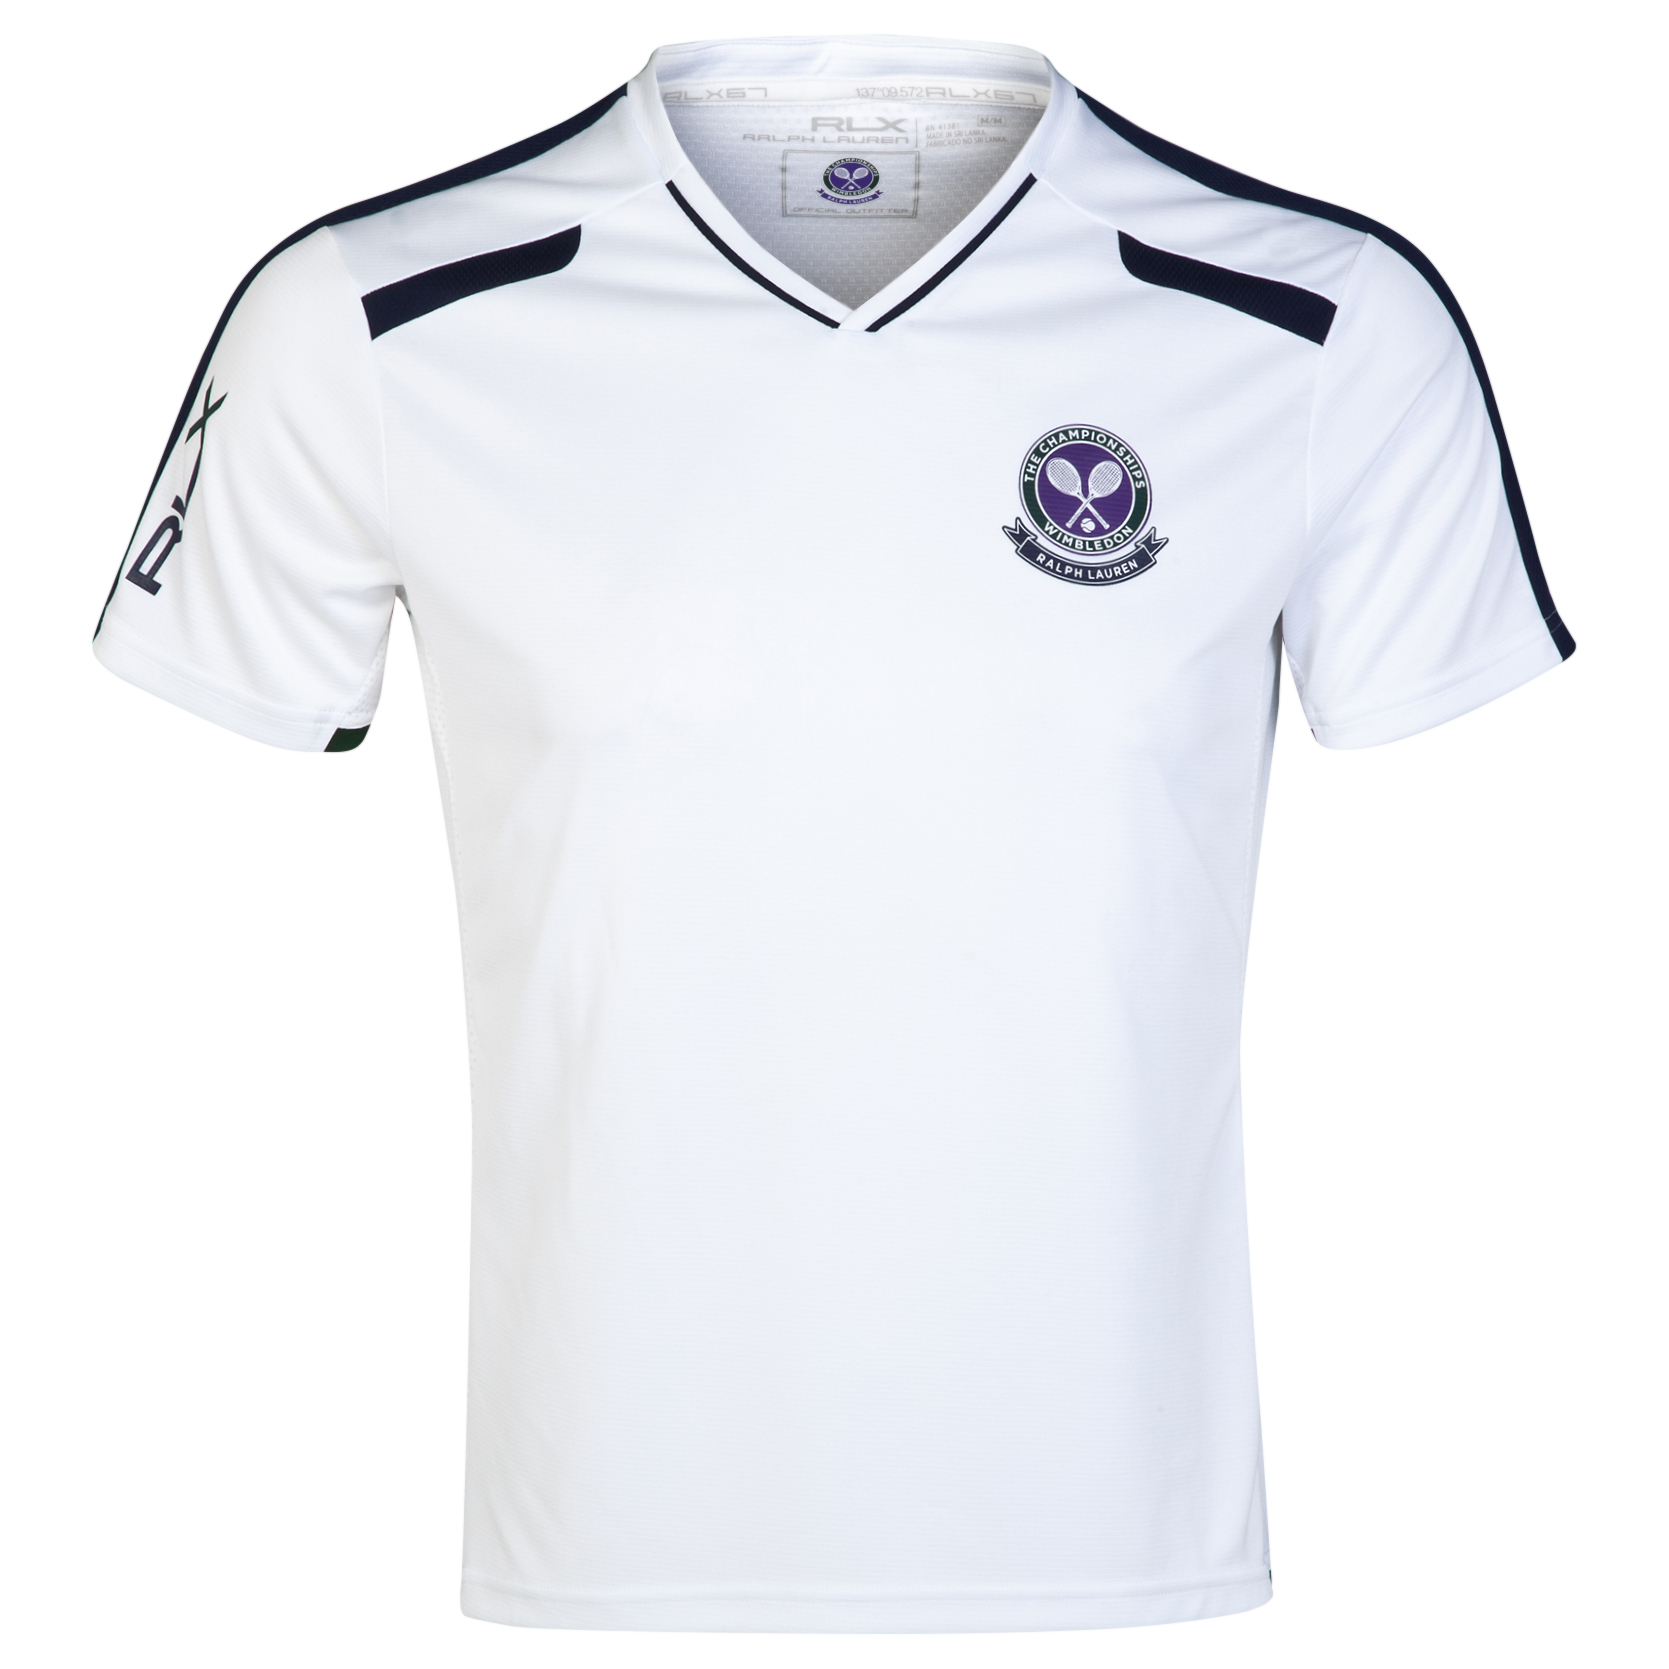 Wimbledon Polo Ralph Lauren RLX T-Shirt - Pure White